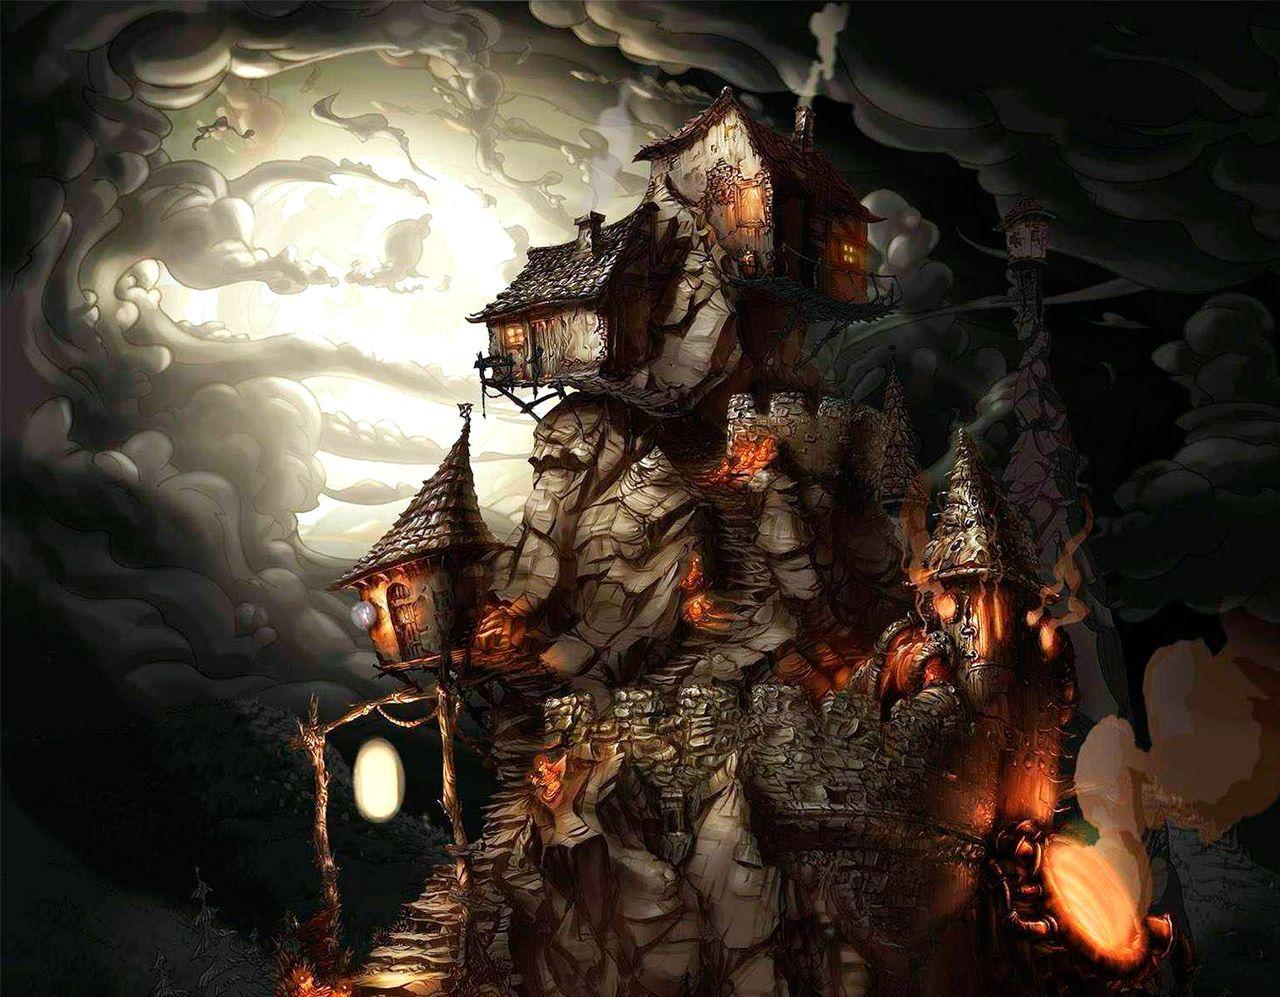 marco h llen 2d fantasy art world wallpaper wallpaper pictures rh pinterest com